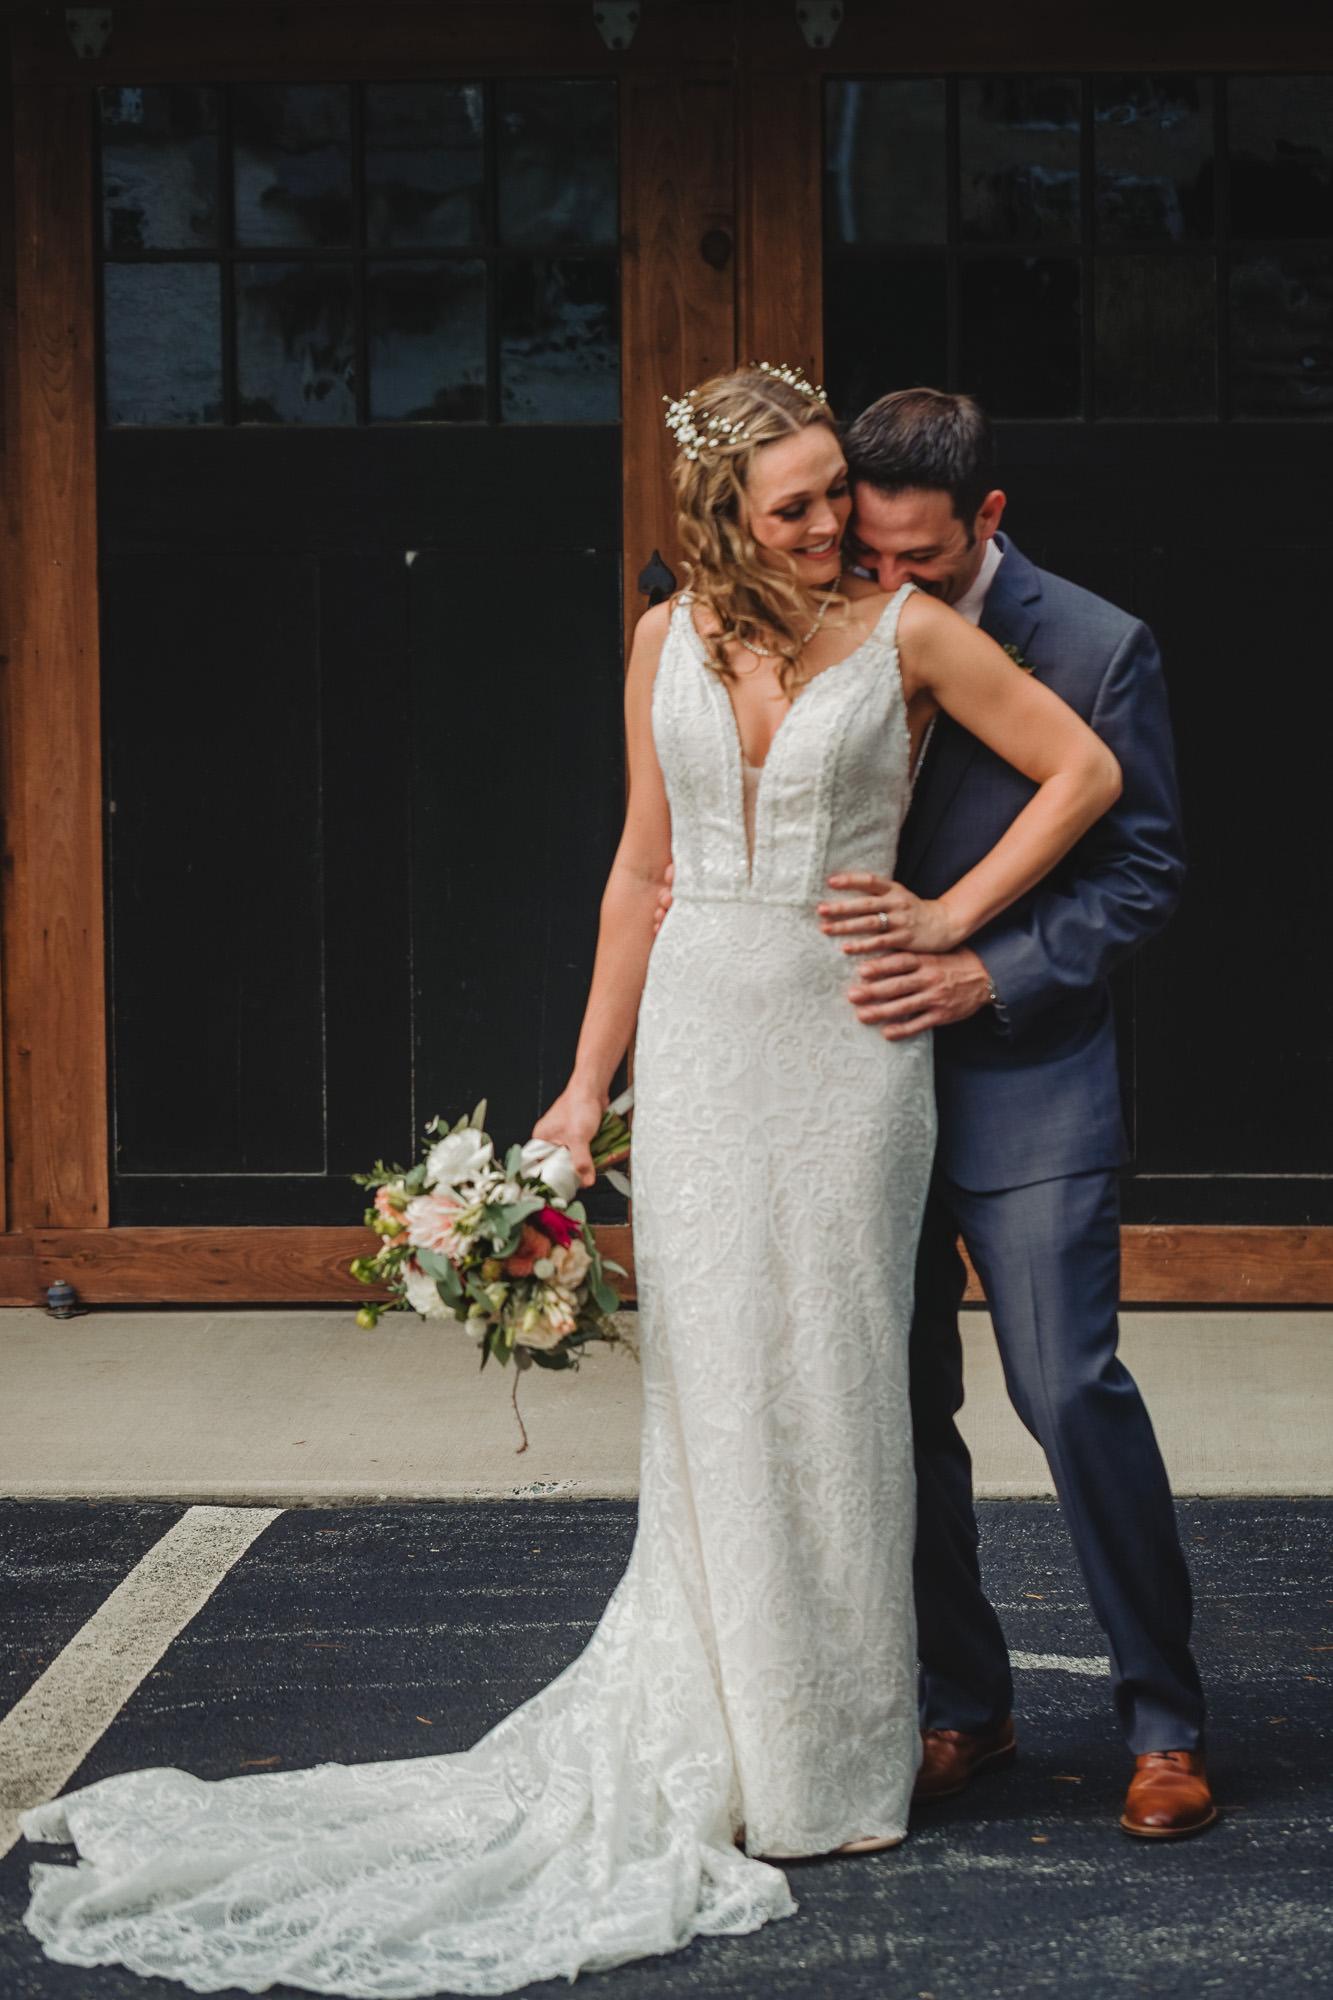 The Barn at Silverstone Wedding - Aubrey & Charlie19.JPG